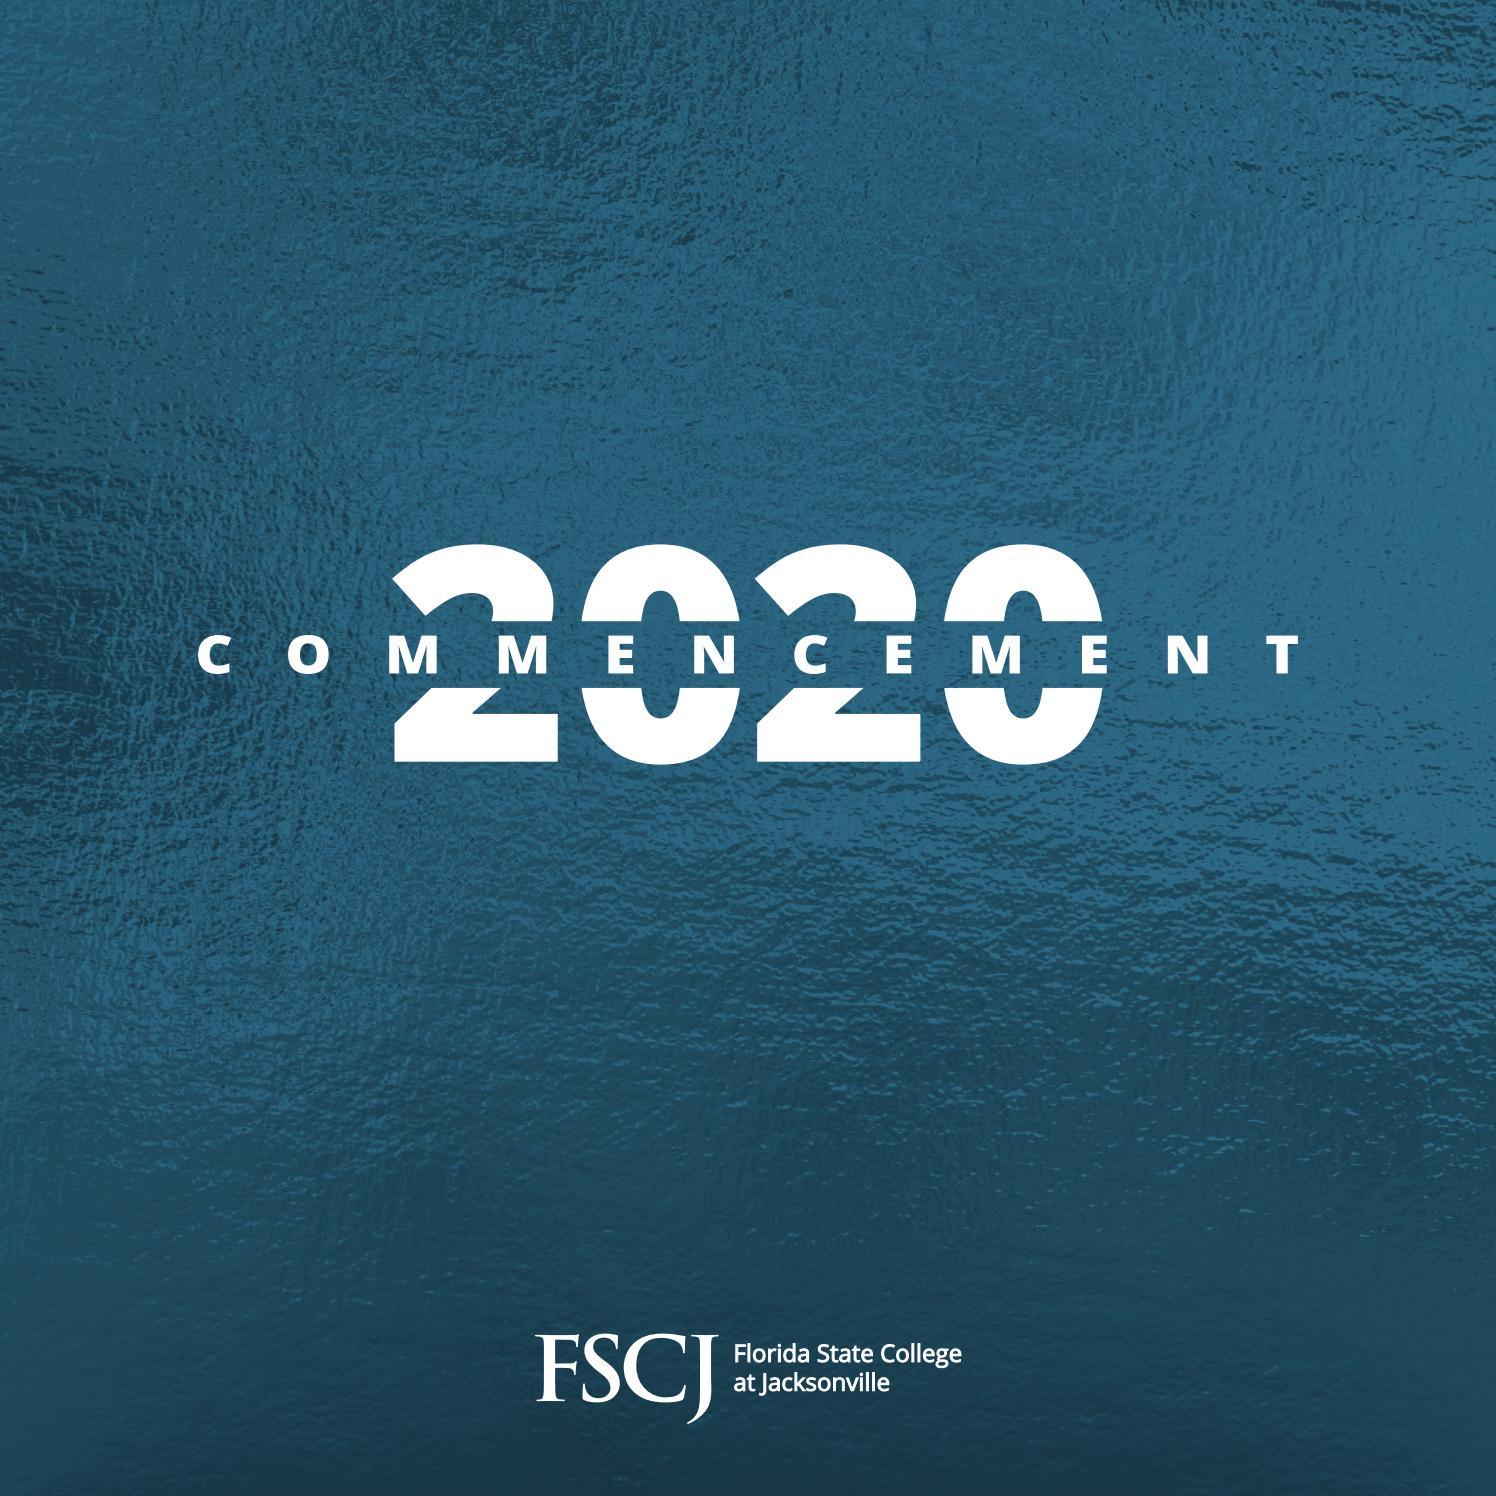 Commencement 2020 Program By Fscjpublications Issuu